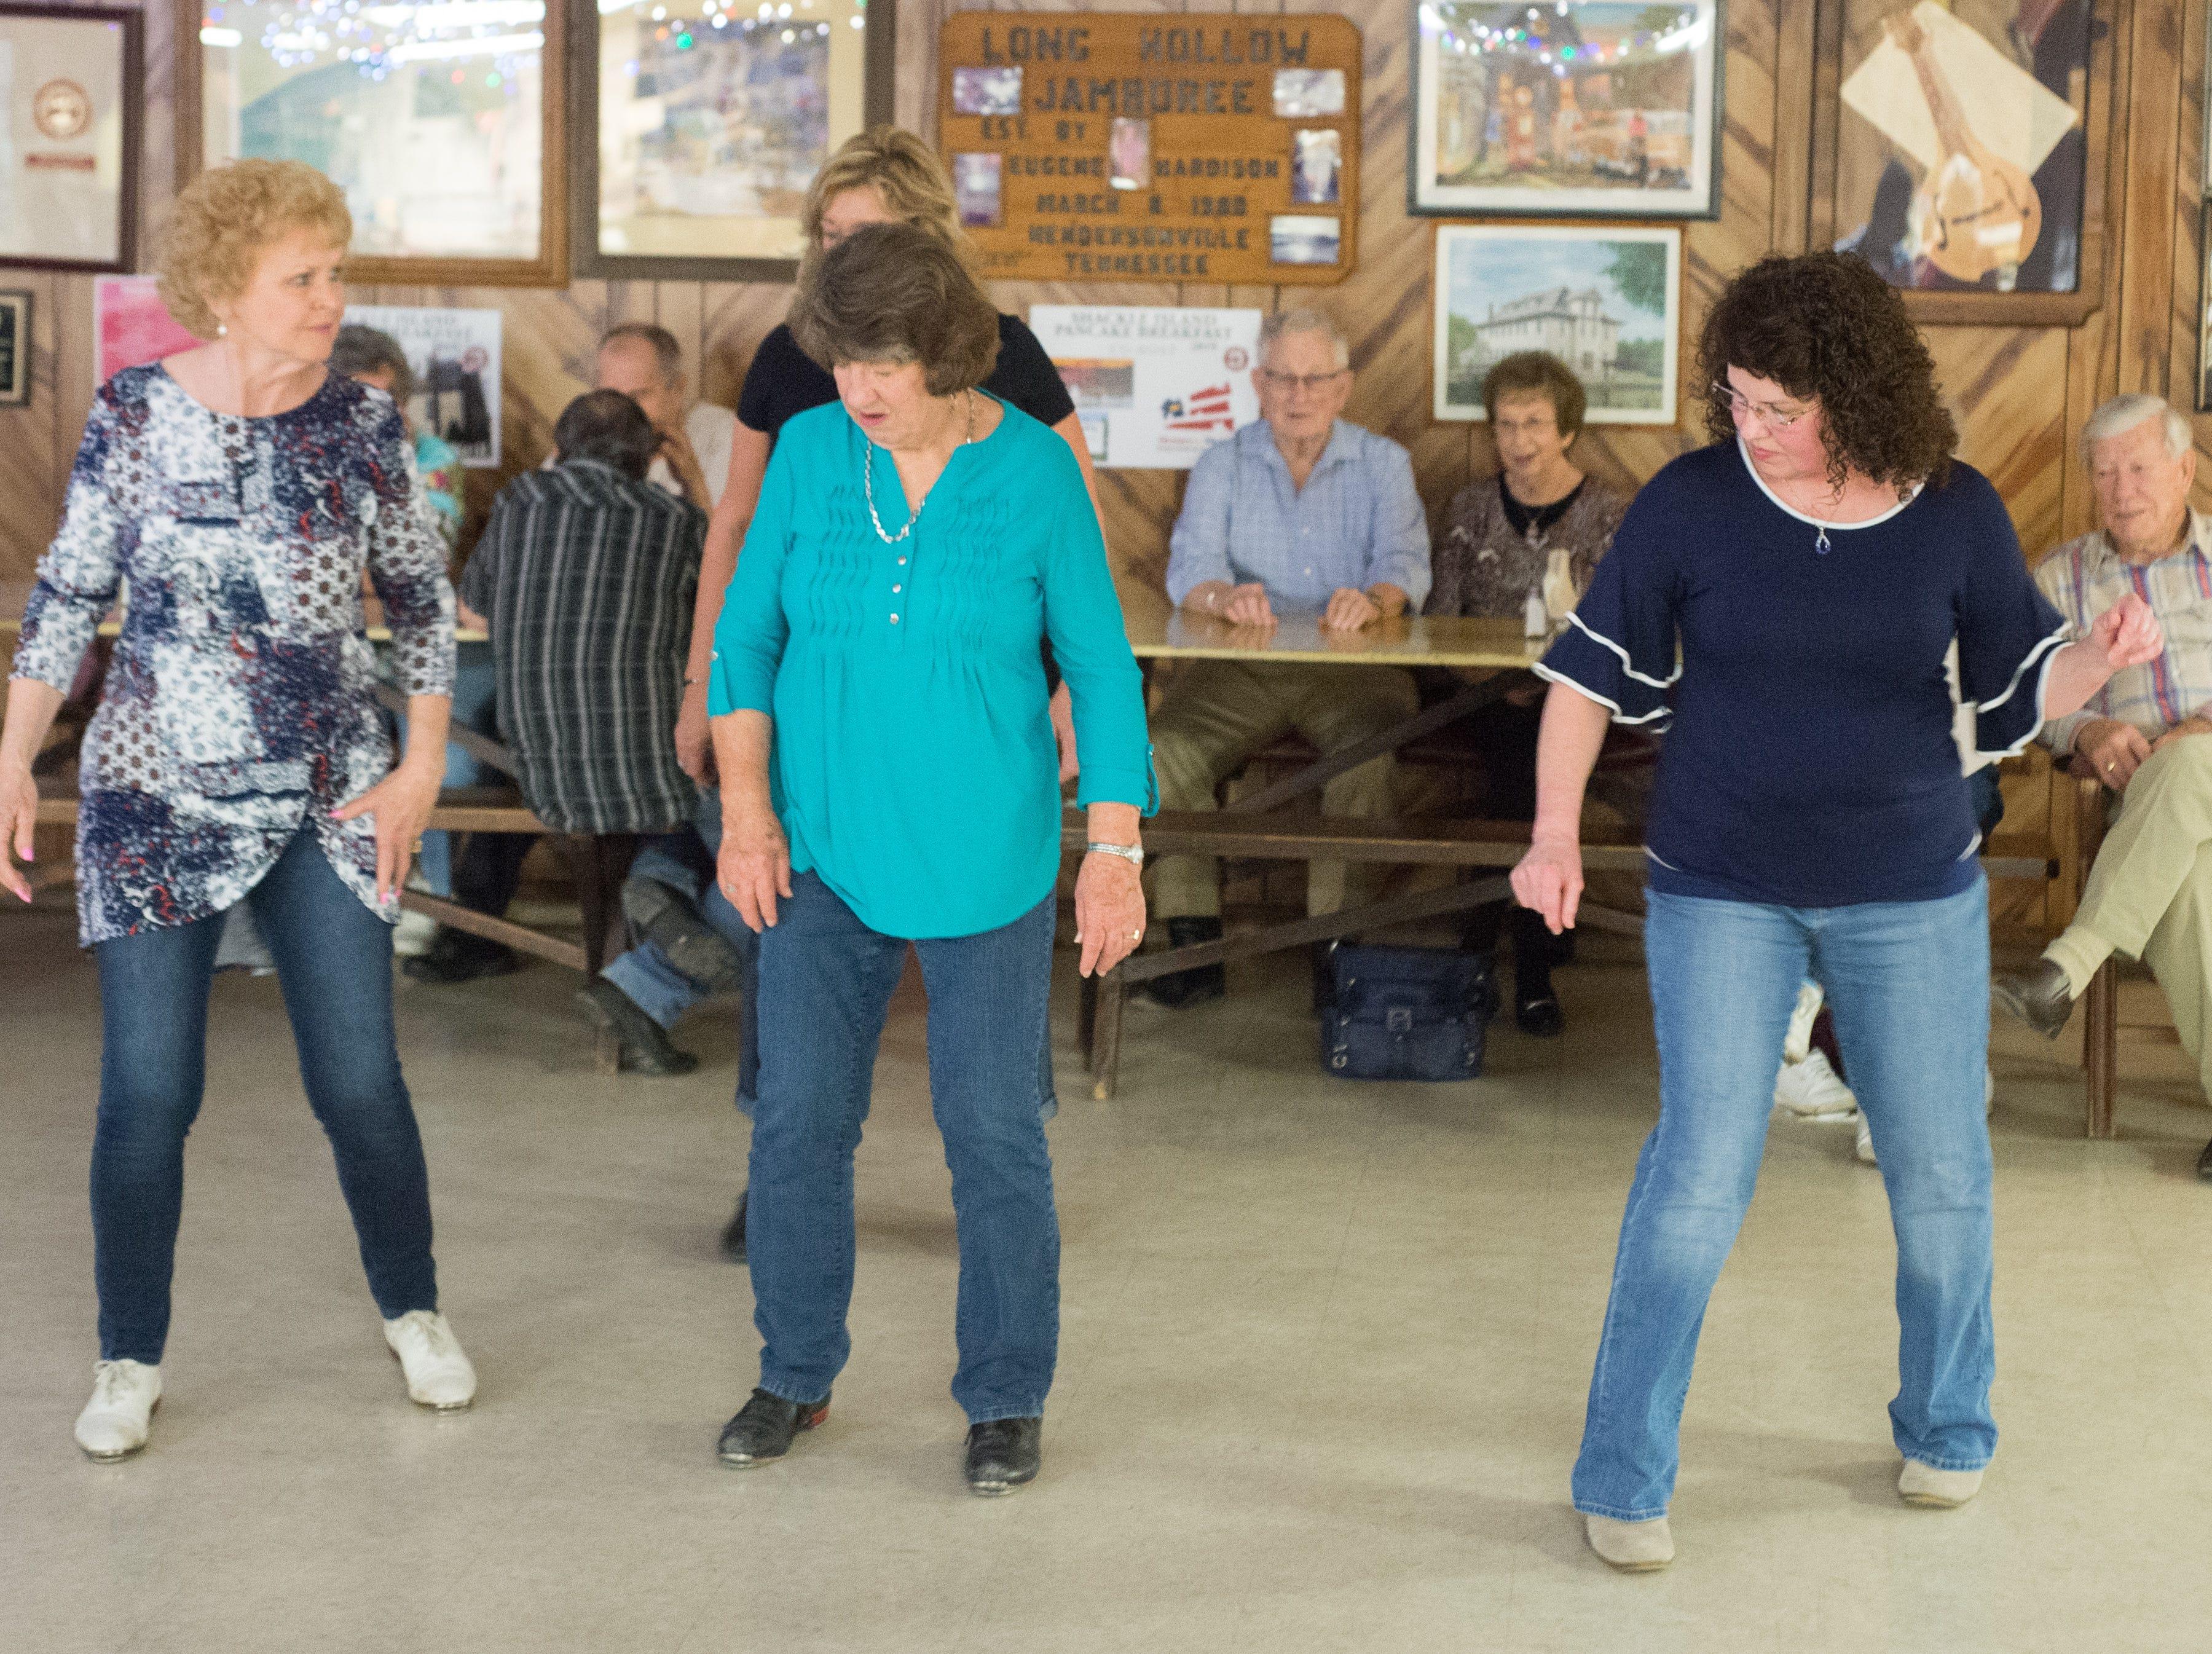 Attendees enjoy having fun at Long Hollow Jamboree in Goodlettsville on Saturday, April 7.